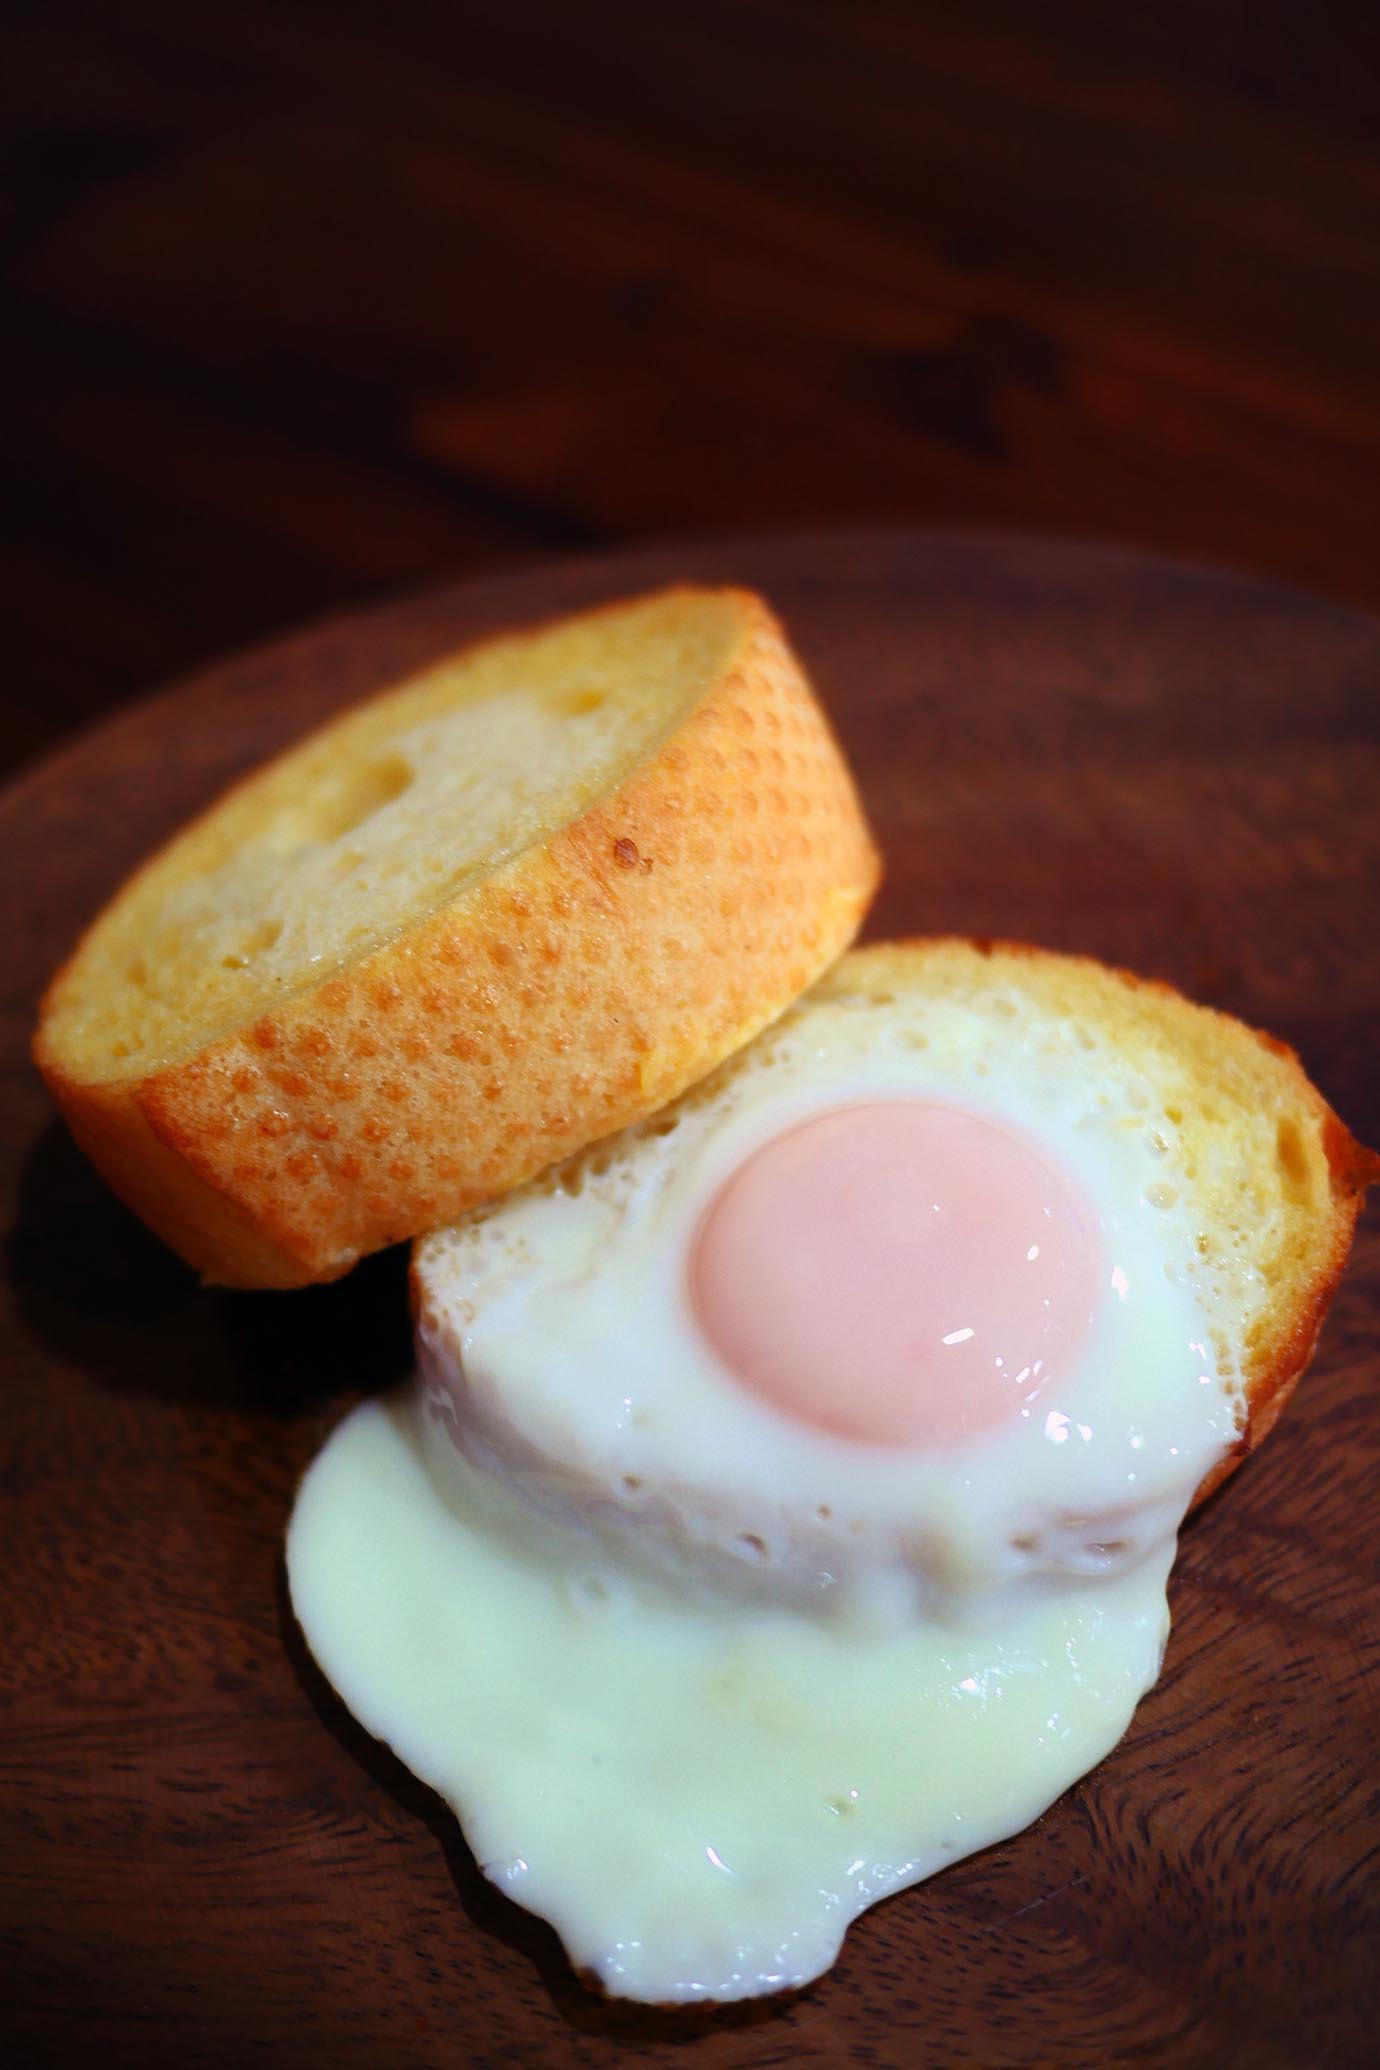 lawson-machinopan-french-toast-french-bread1